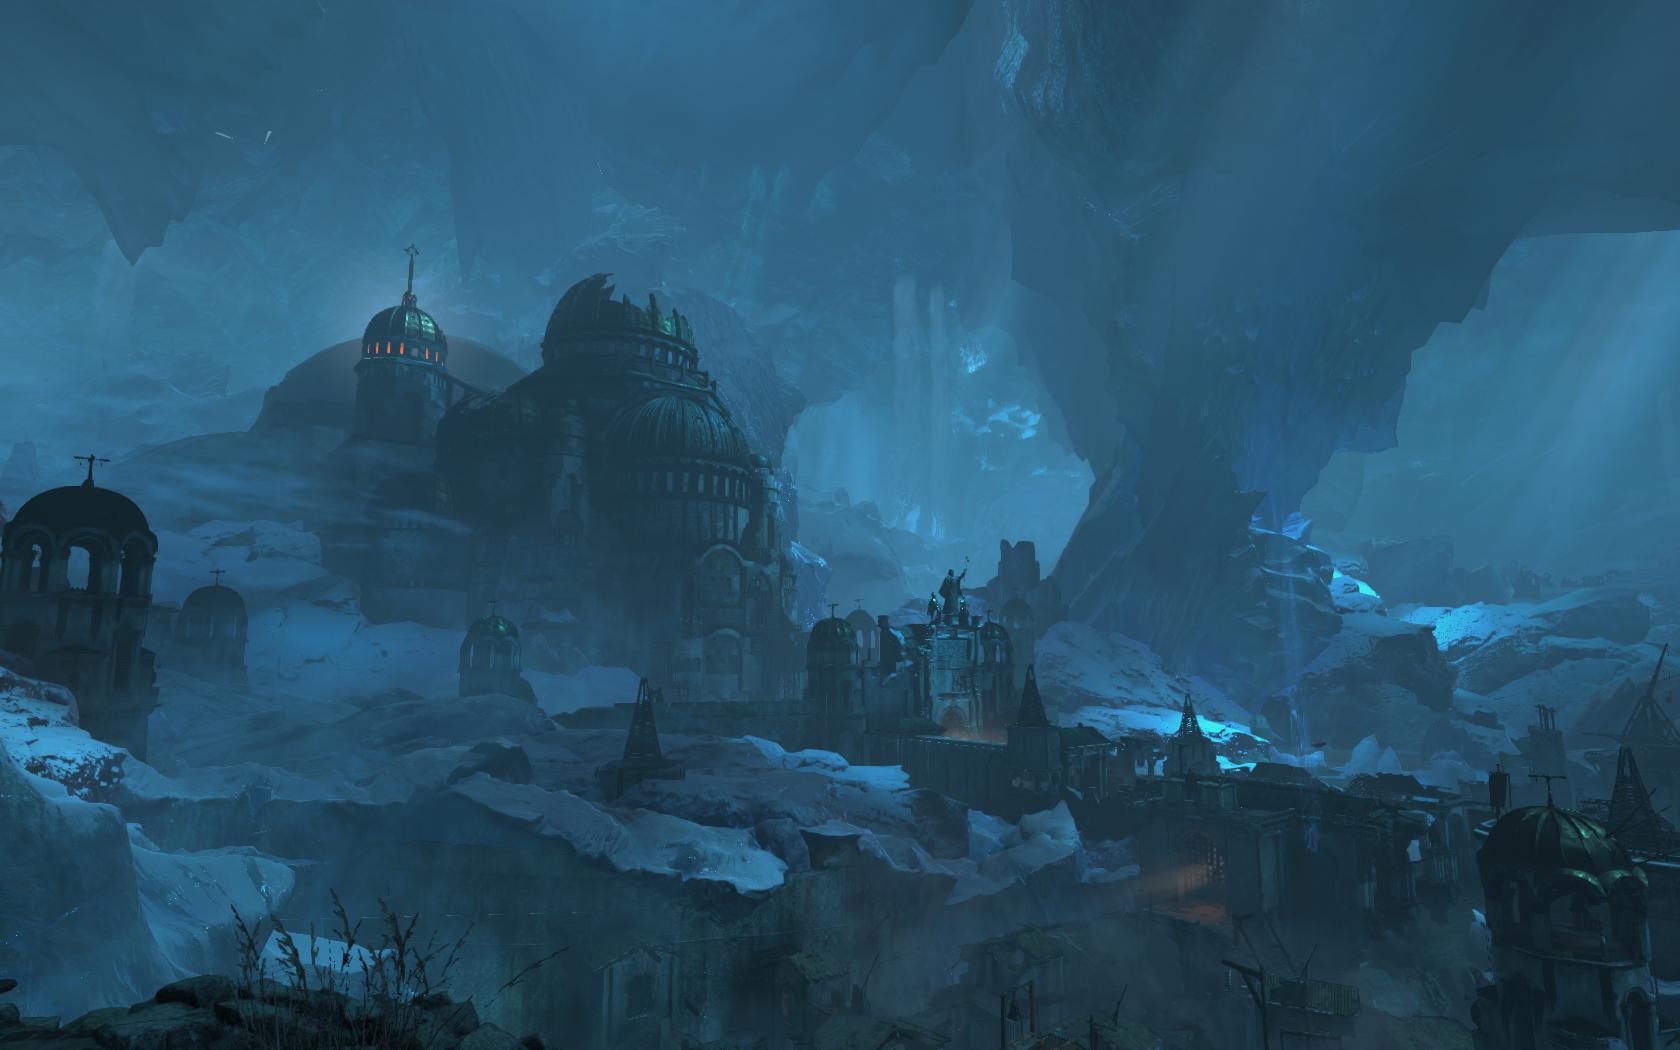 Imagen de Kitezh en el videojuego 'Rise of the Tom Raider'